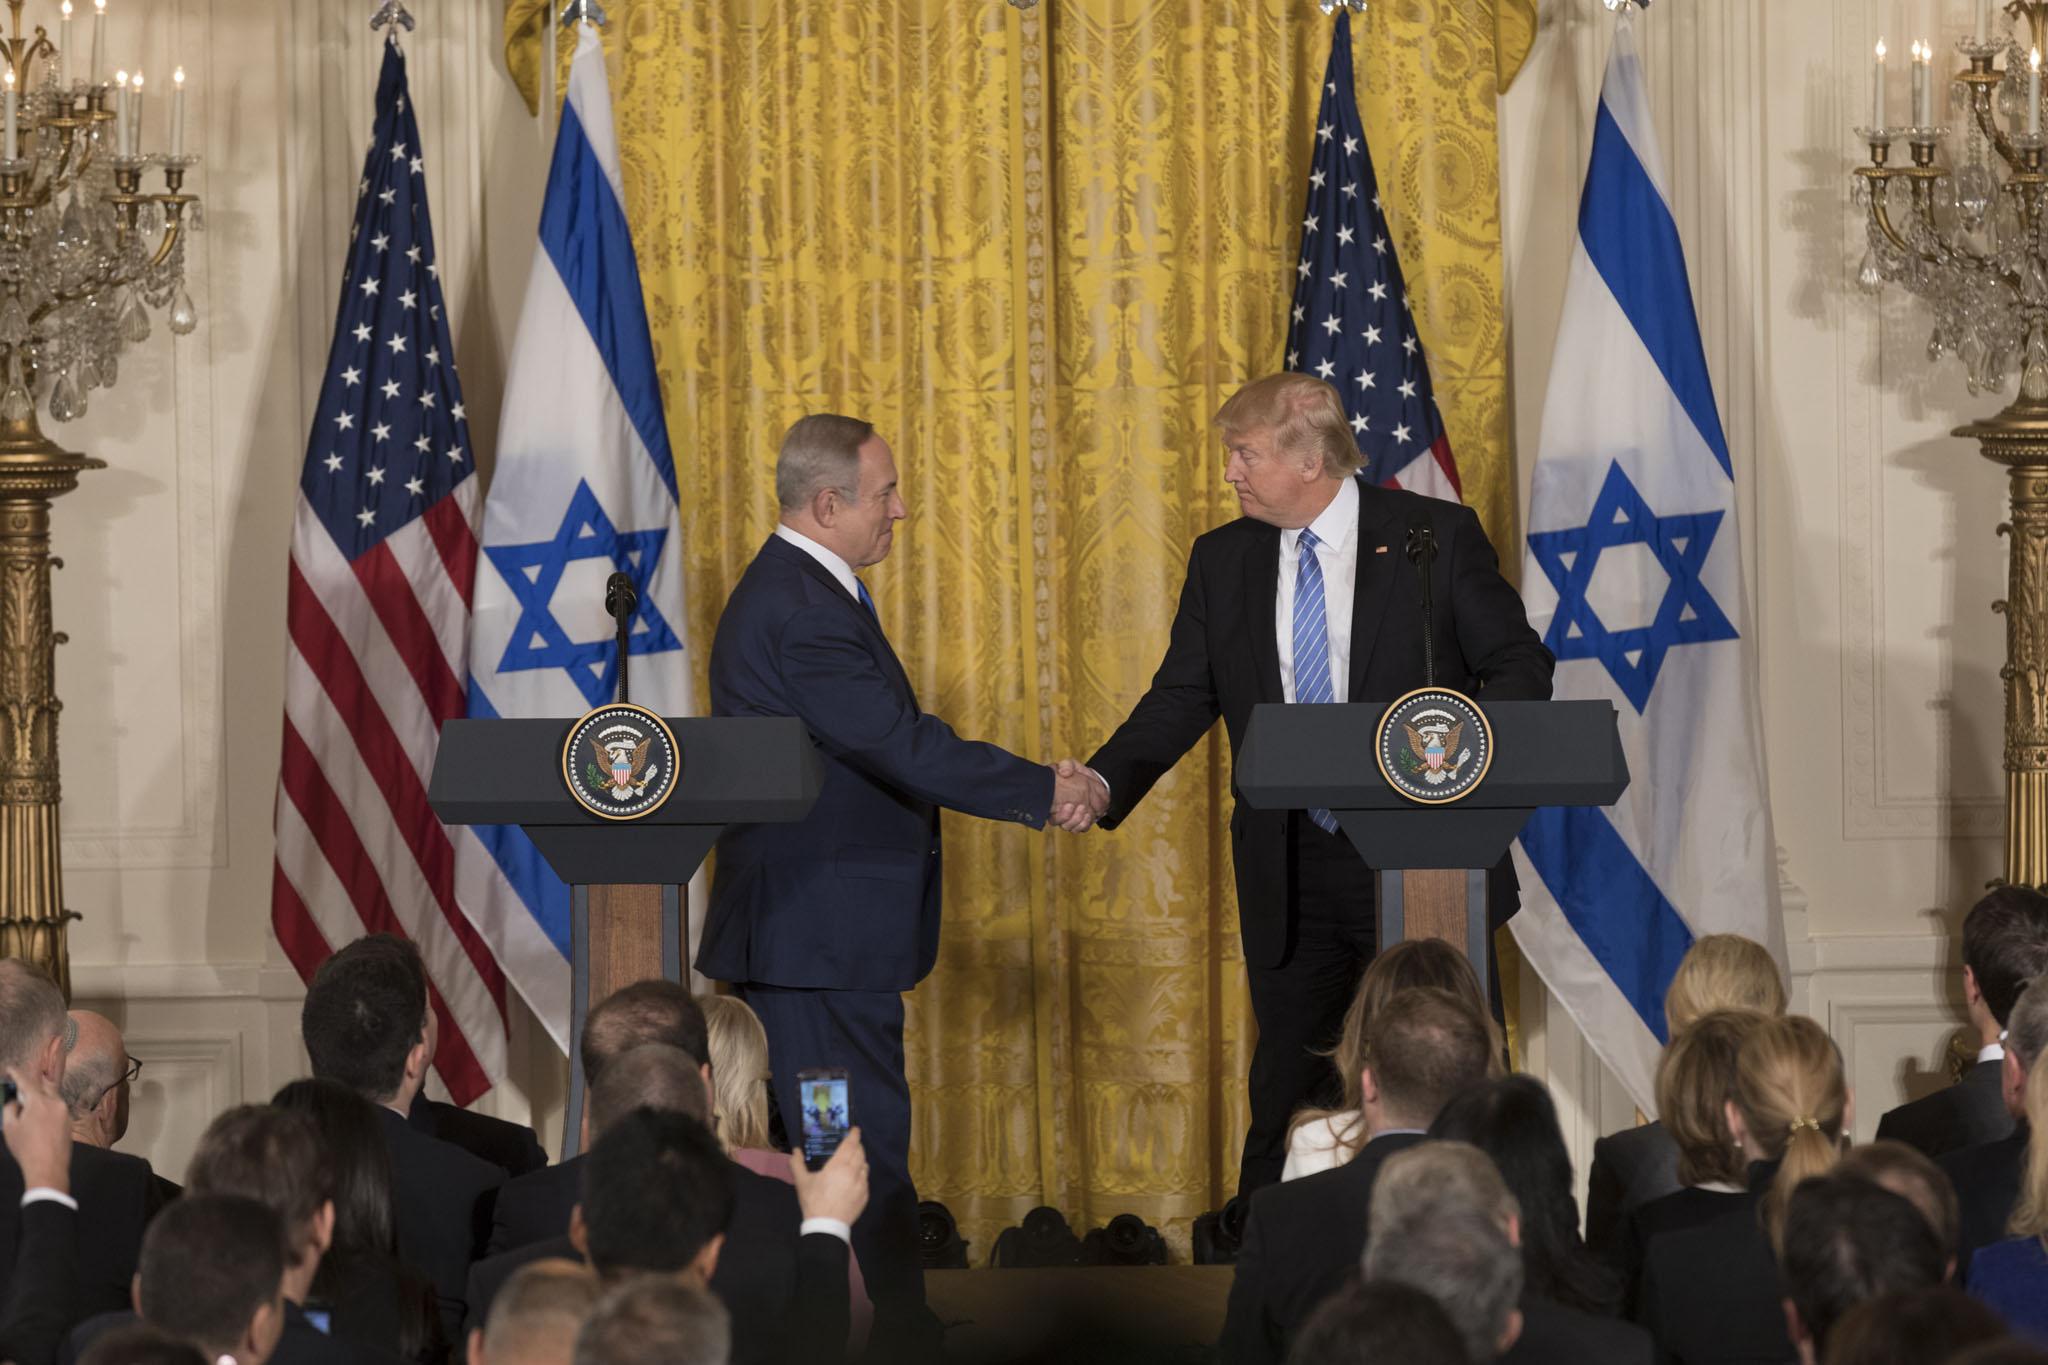 Trump and Netanyahu reveal Israel-Palestine peace plan